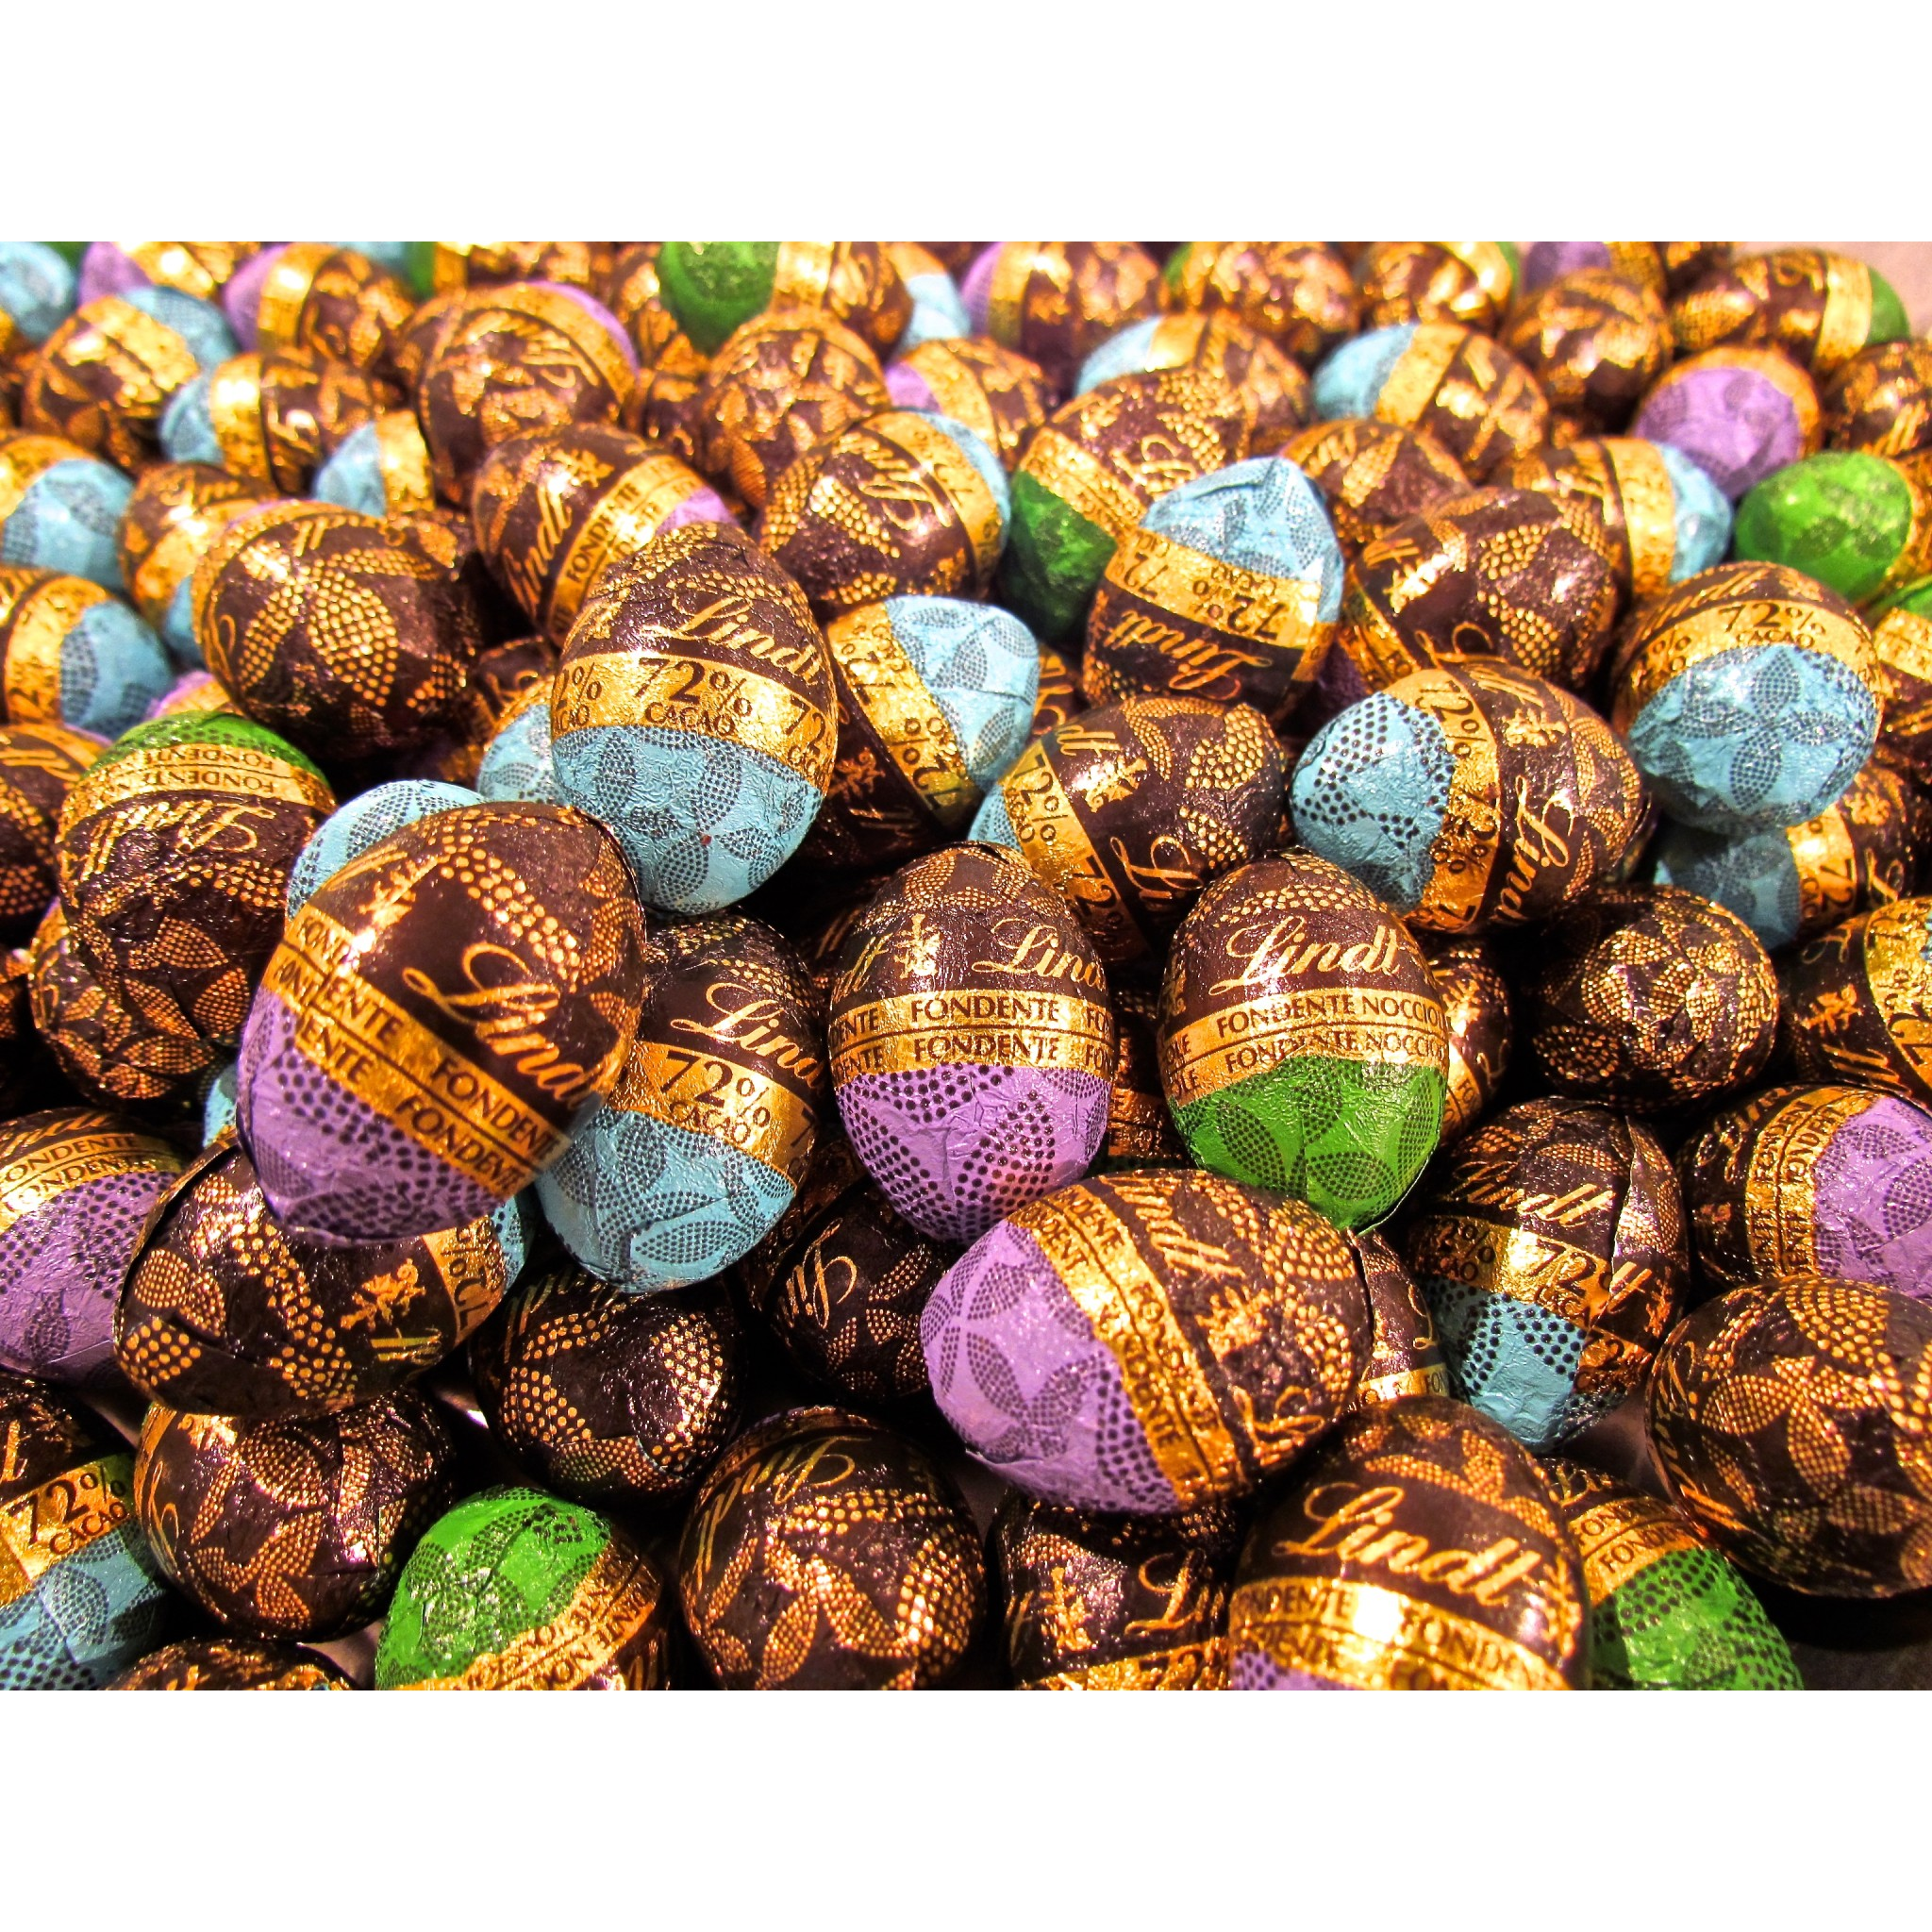 Lindt   Dark Chocolate   Assorted Eggs   18g